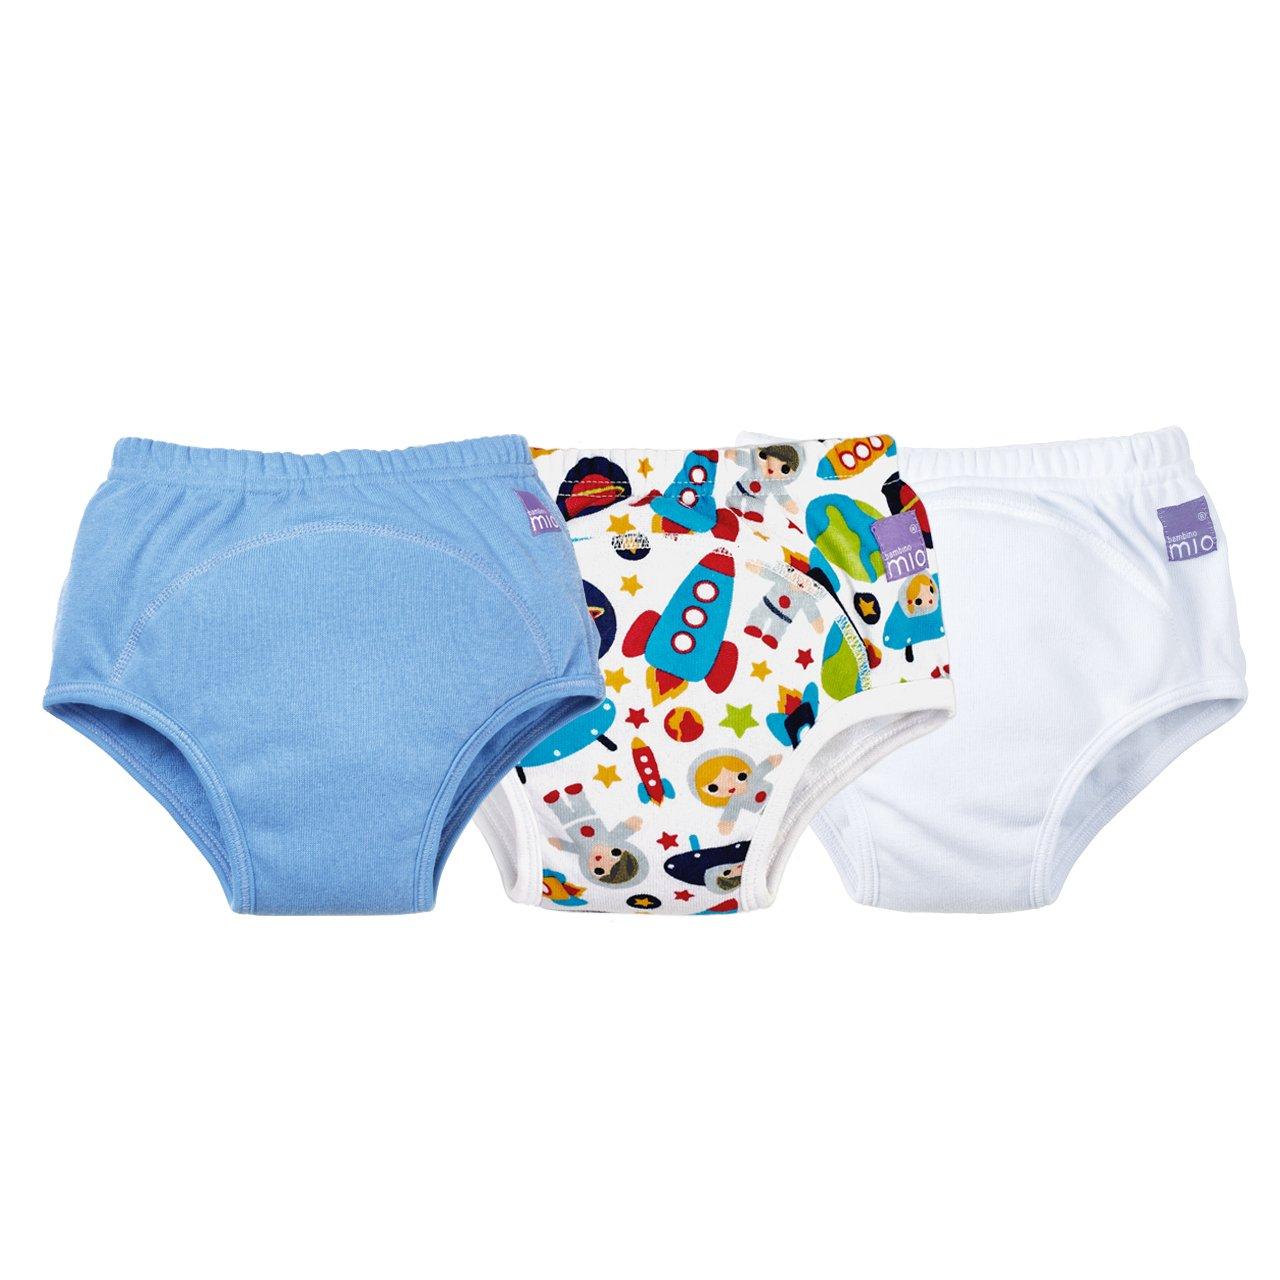 Bambino Mio, Potty Training Pants, Mixed Boy, 3+ Years, 3 Pack